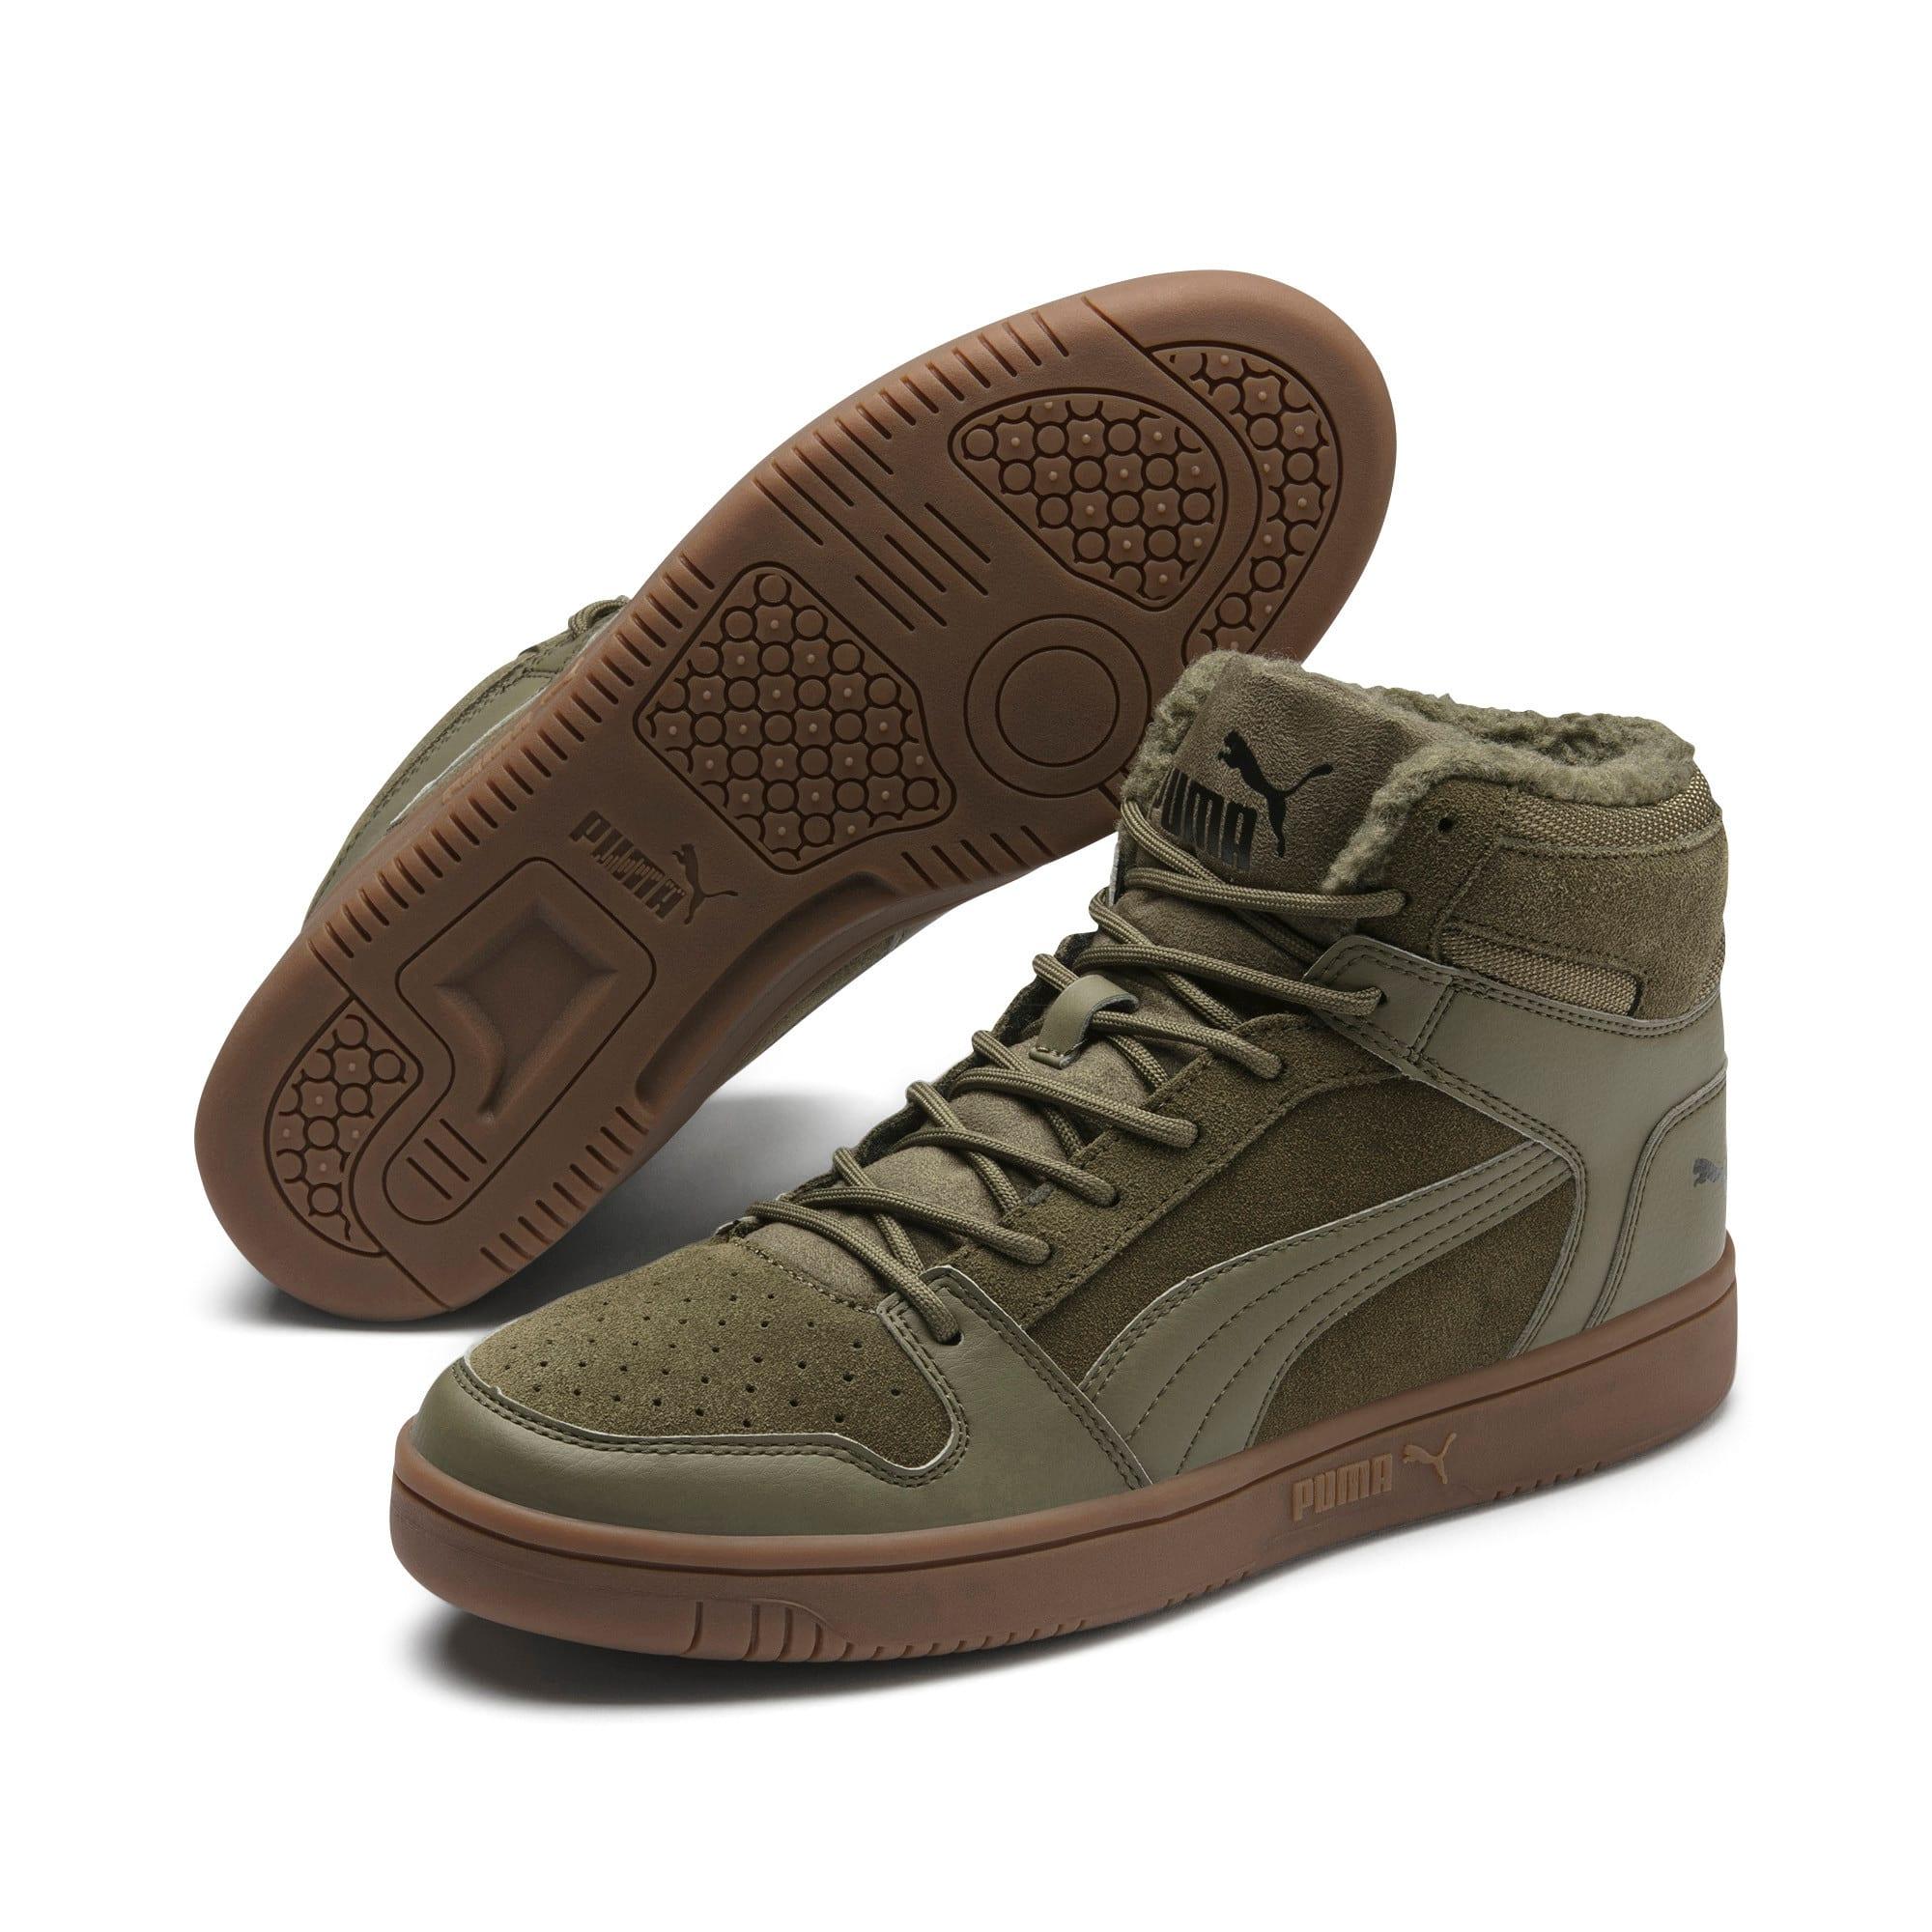 Thumbnail 3 of Rebound Lay Up SD Fur Sneaker, Burnt Olive-Puma Black-Gum, medium